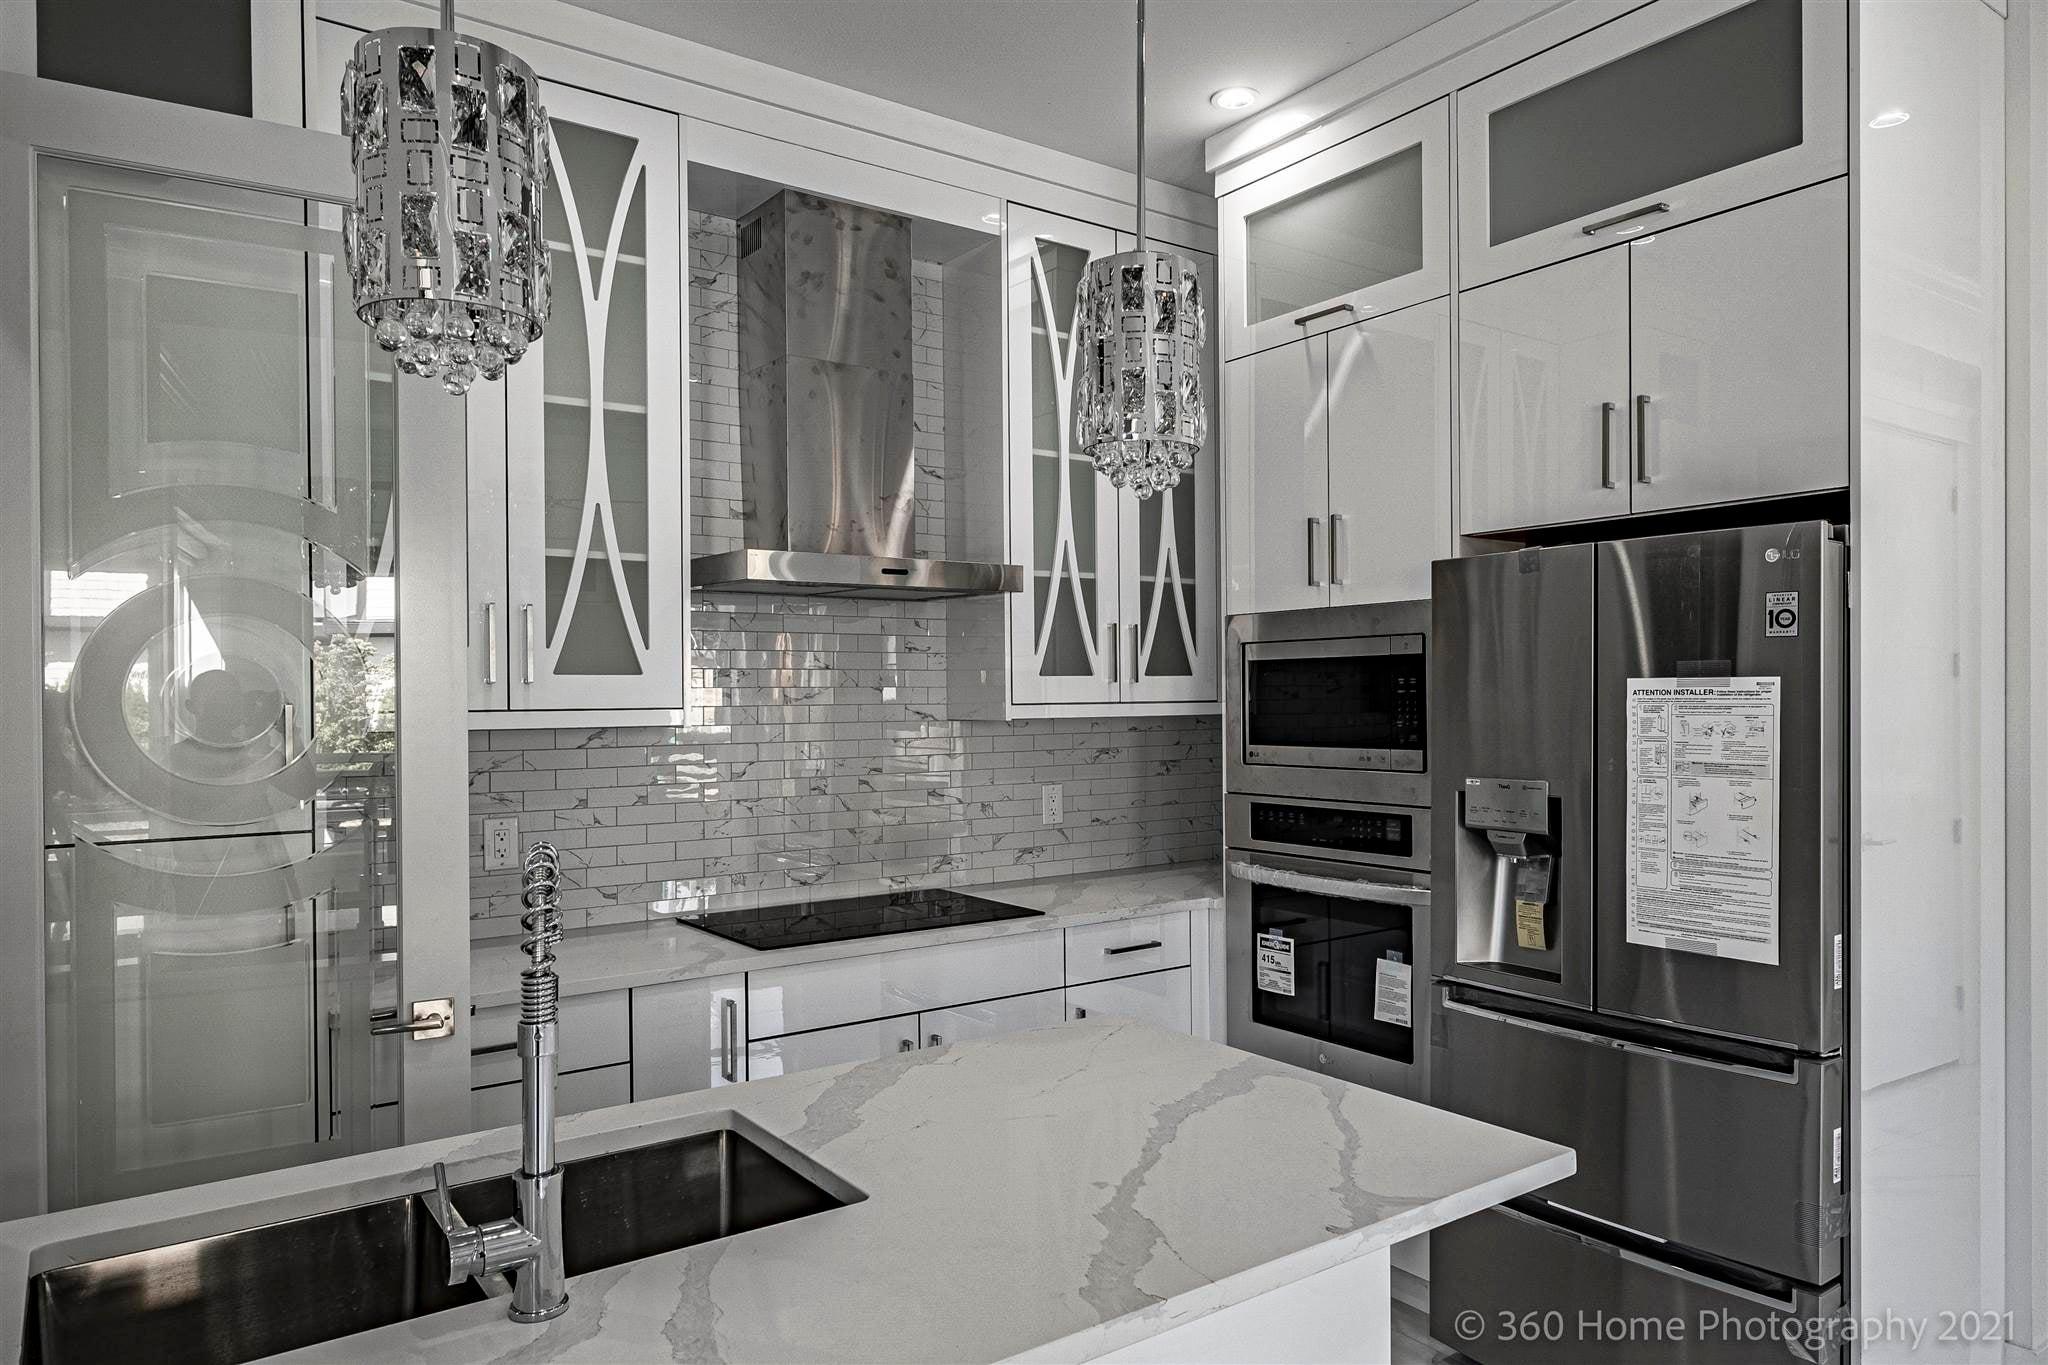 13050 101B AVENUE - Cedar Hills House/Single Family for sale, 5 Bedrooms (R2602208) - #10